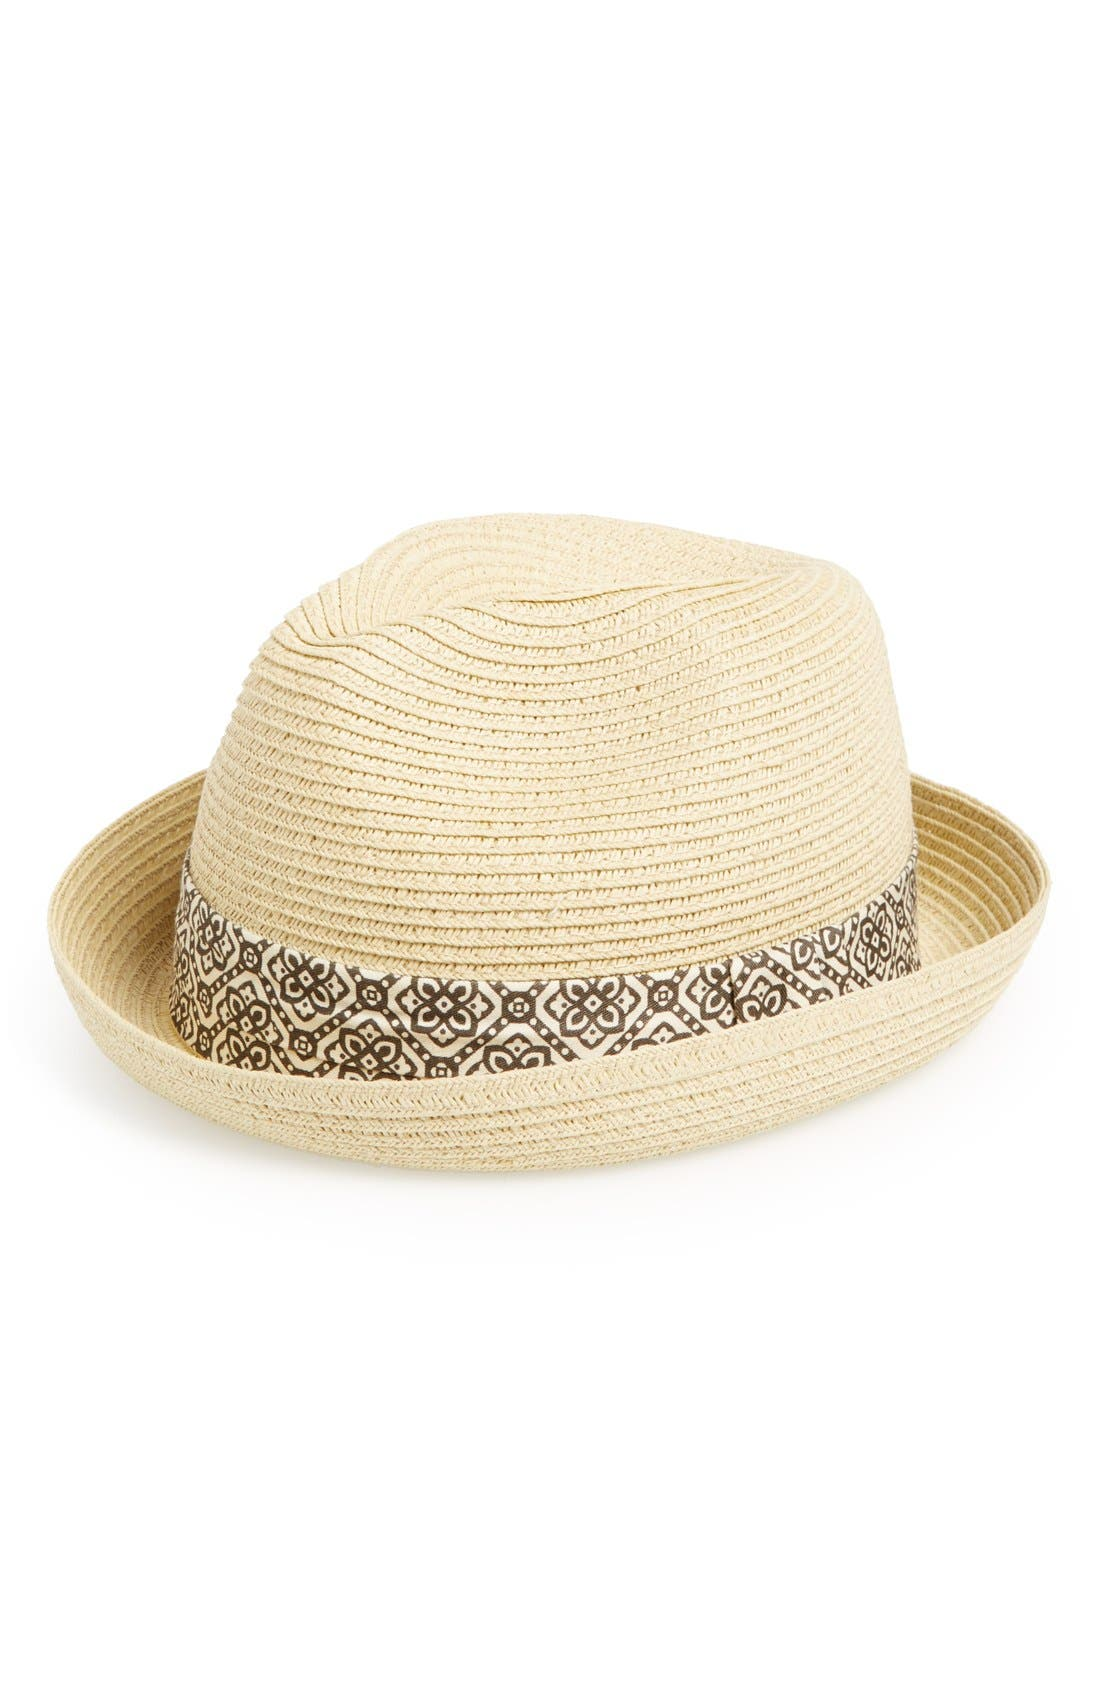 Alternate Image 1 Selected - San Diego Hat Fedora (Toddler Boys)